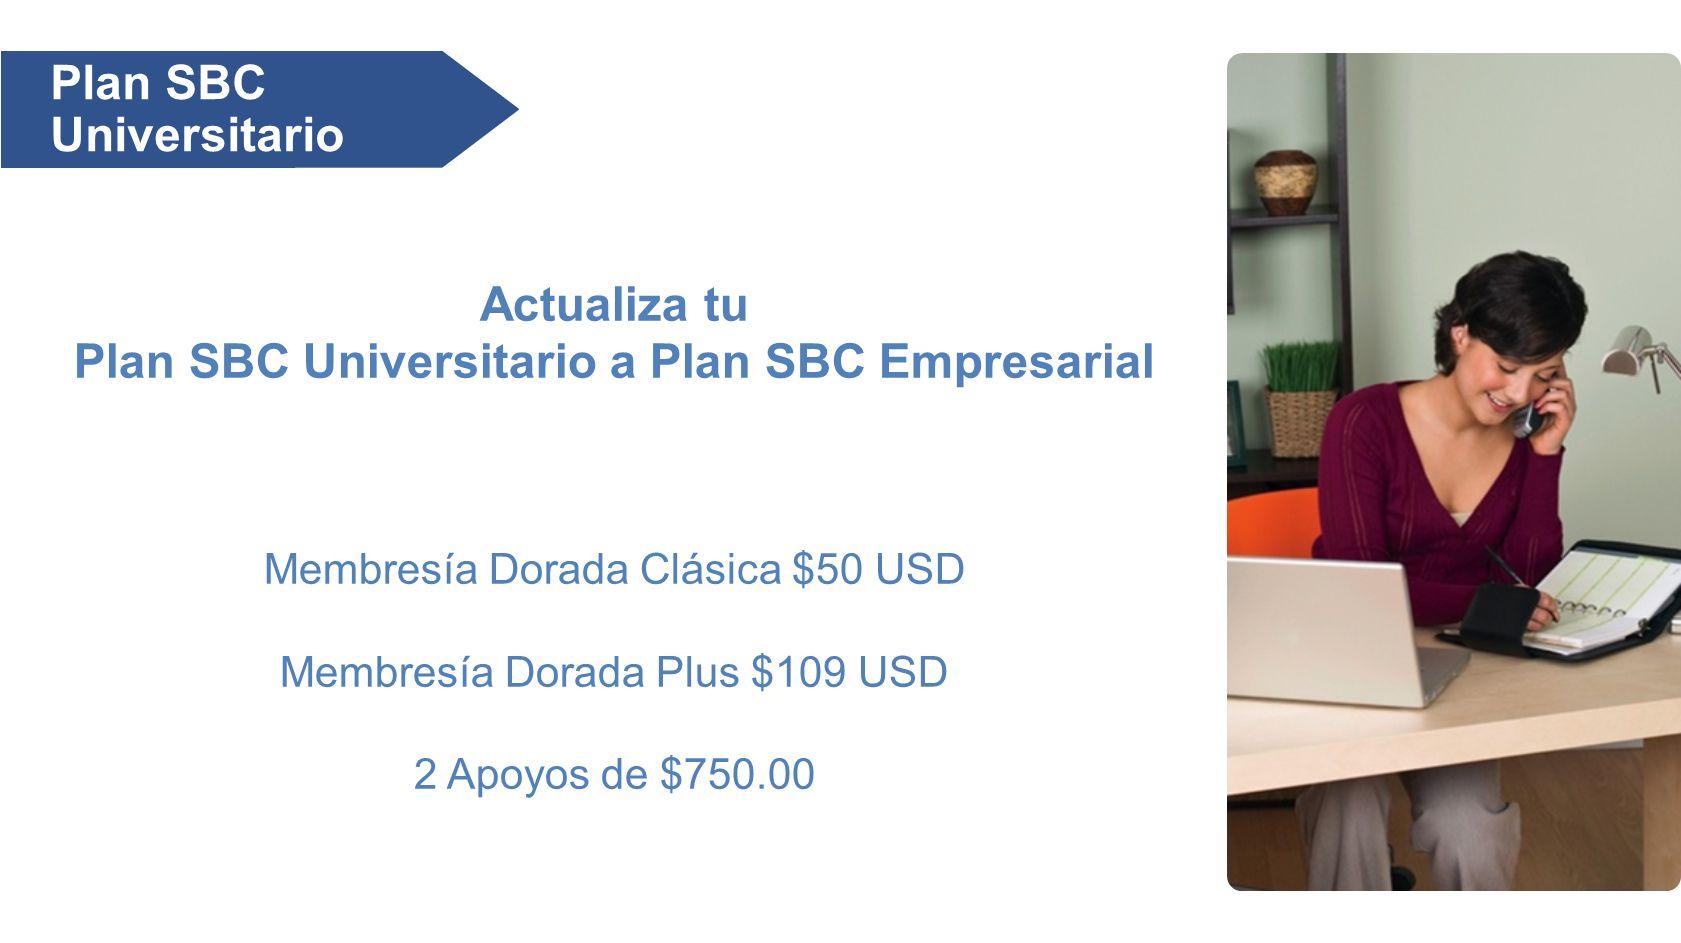 Actualiza tu Plan SBC Universitario a Plan SBC Empresarial Membresía Dorada Clásica $50 USD Membresía Dorada Plus $109 USD 2 Apoyos de $750.00